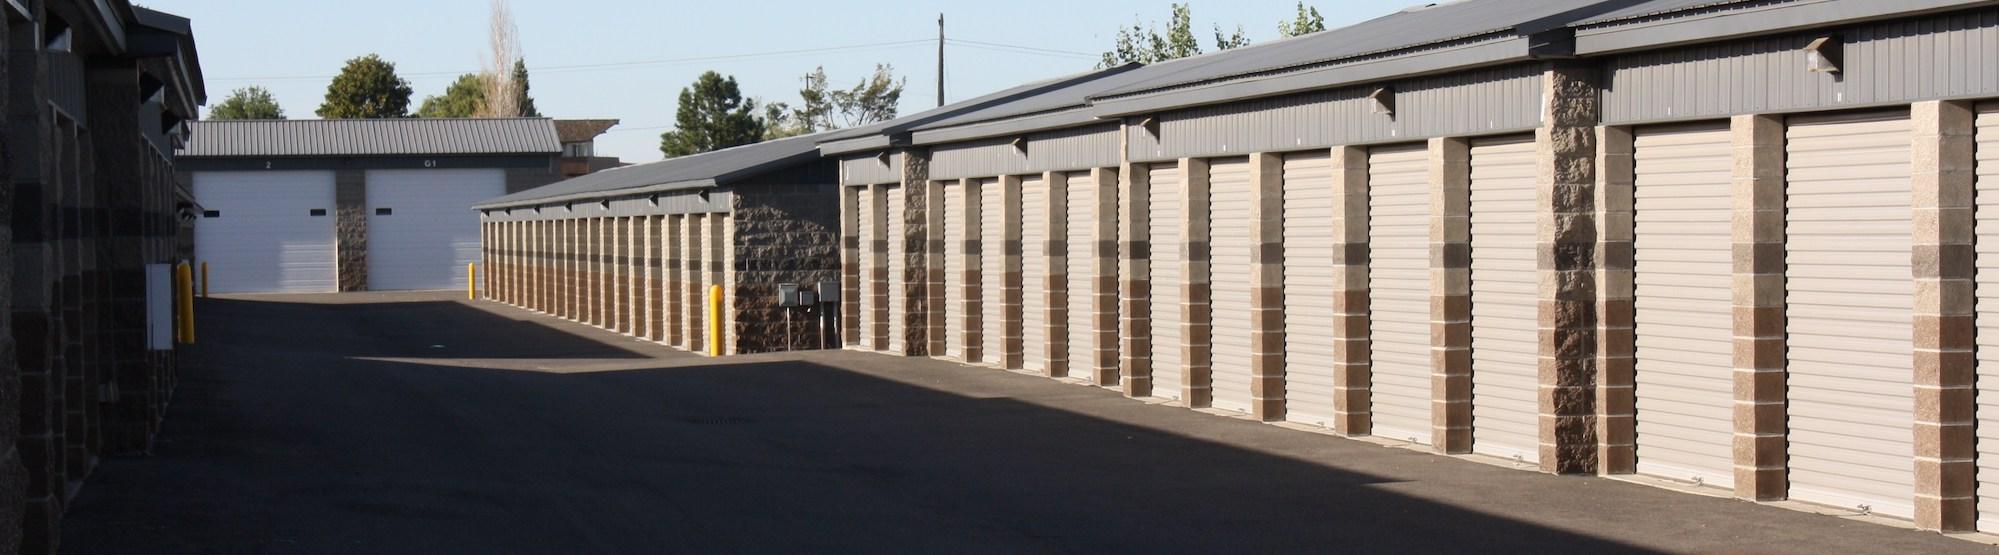 Rows of self storage units in Kennewick, WA